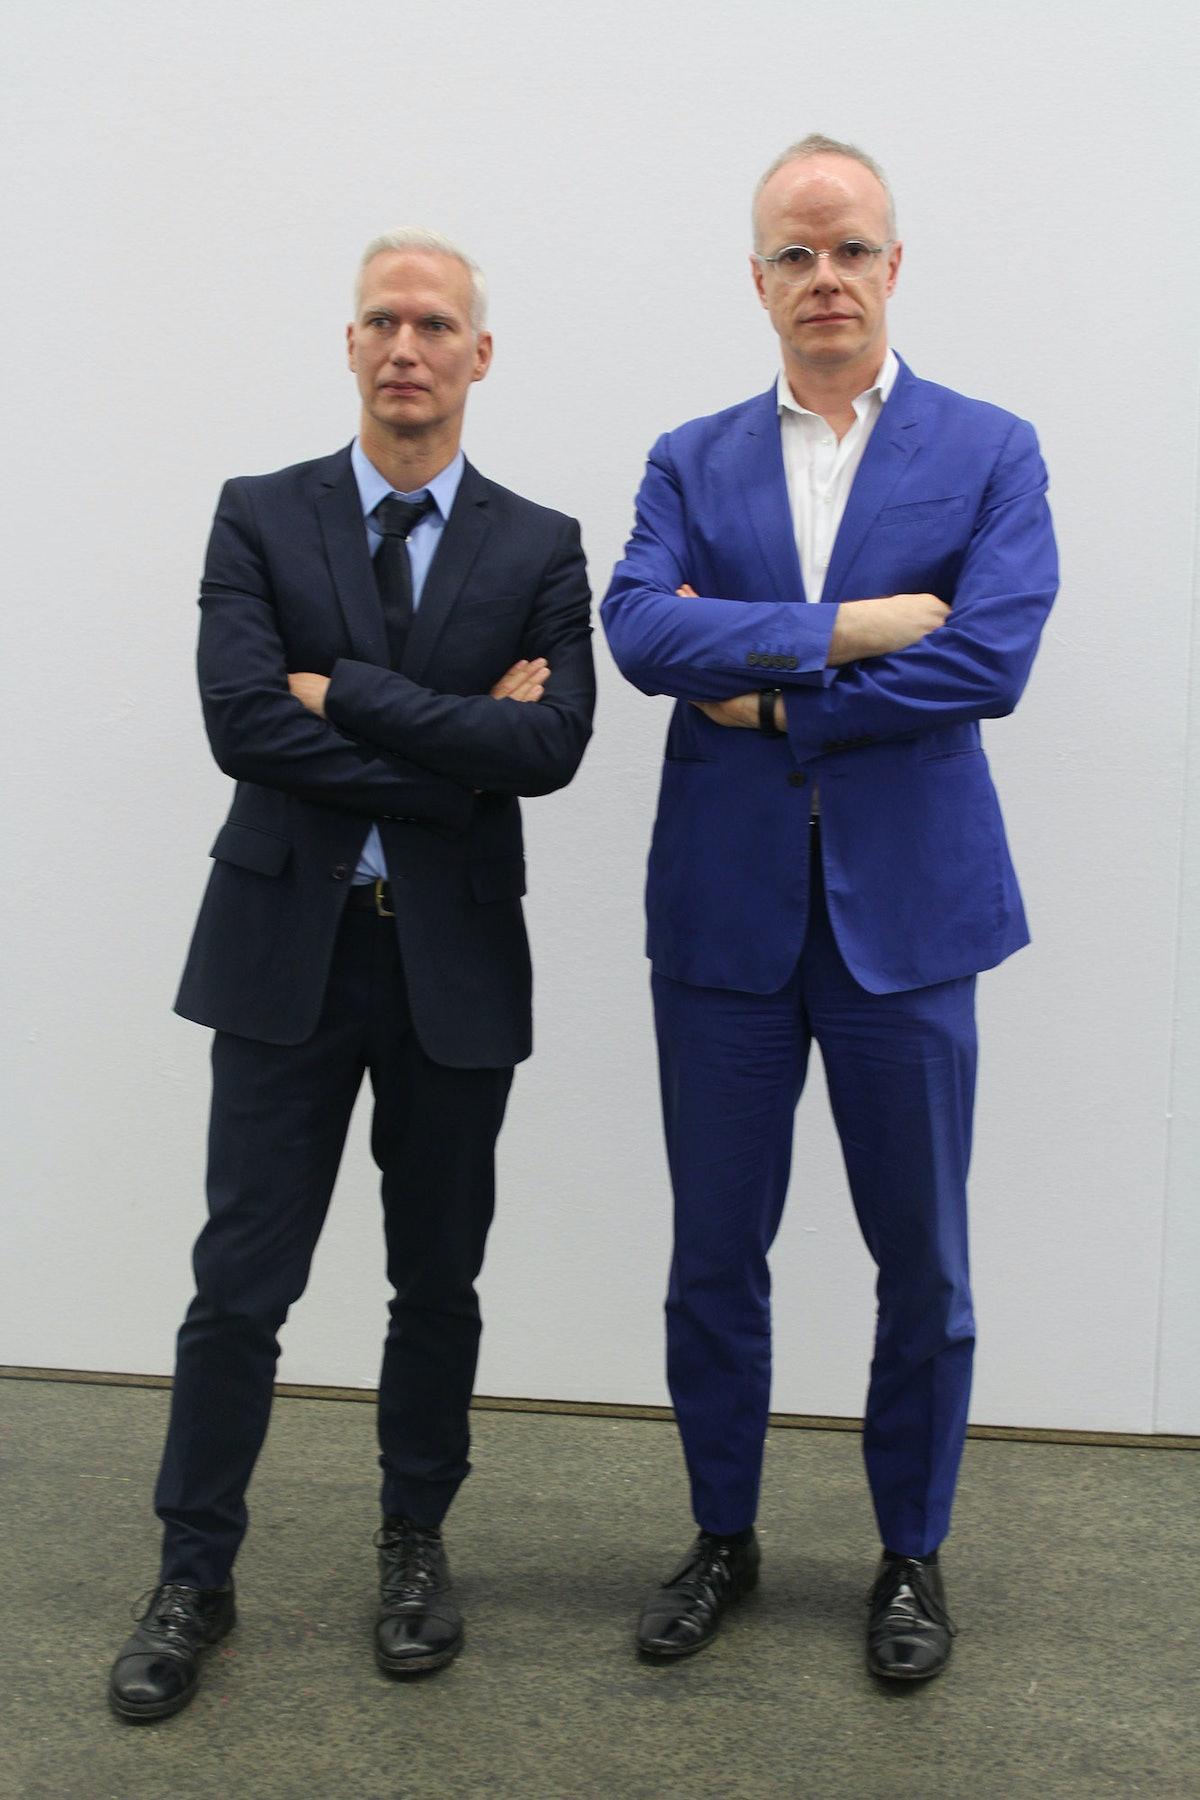 14 Rooms Hans Ulrich Obrist and Klaus Biesenbach